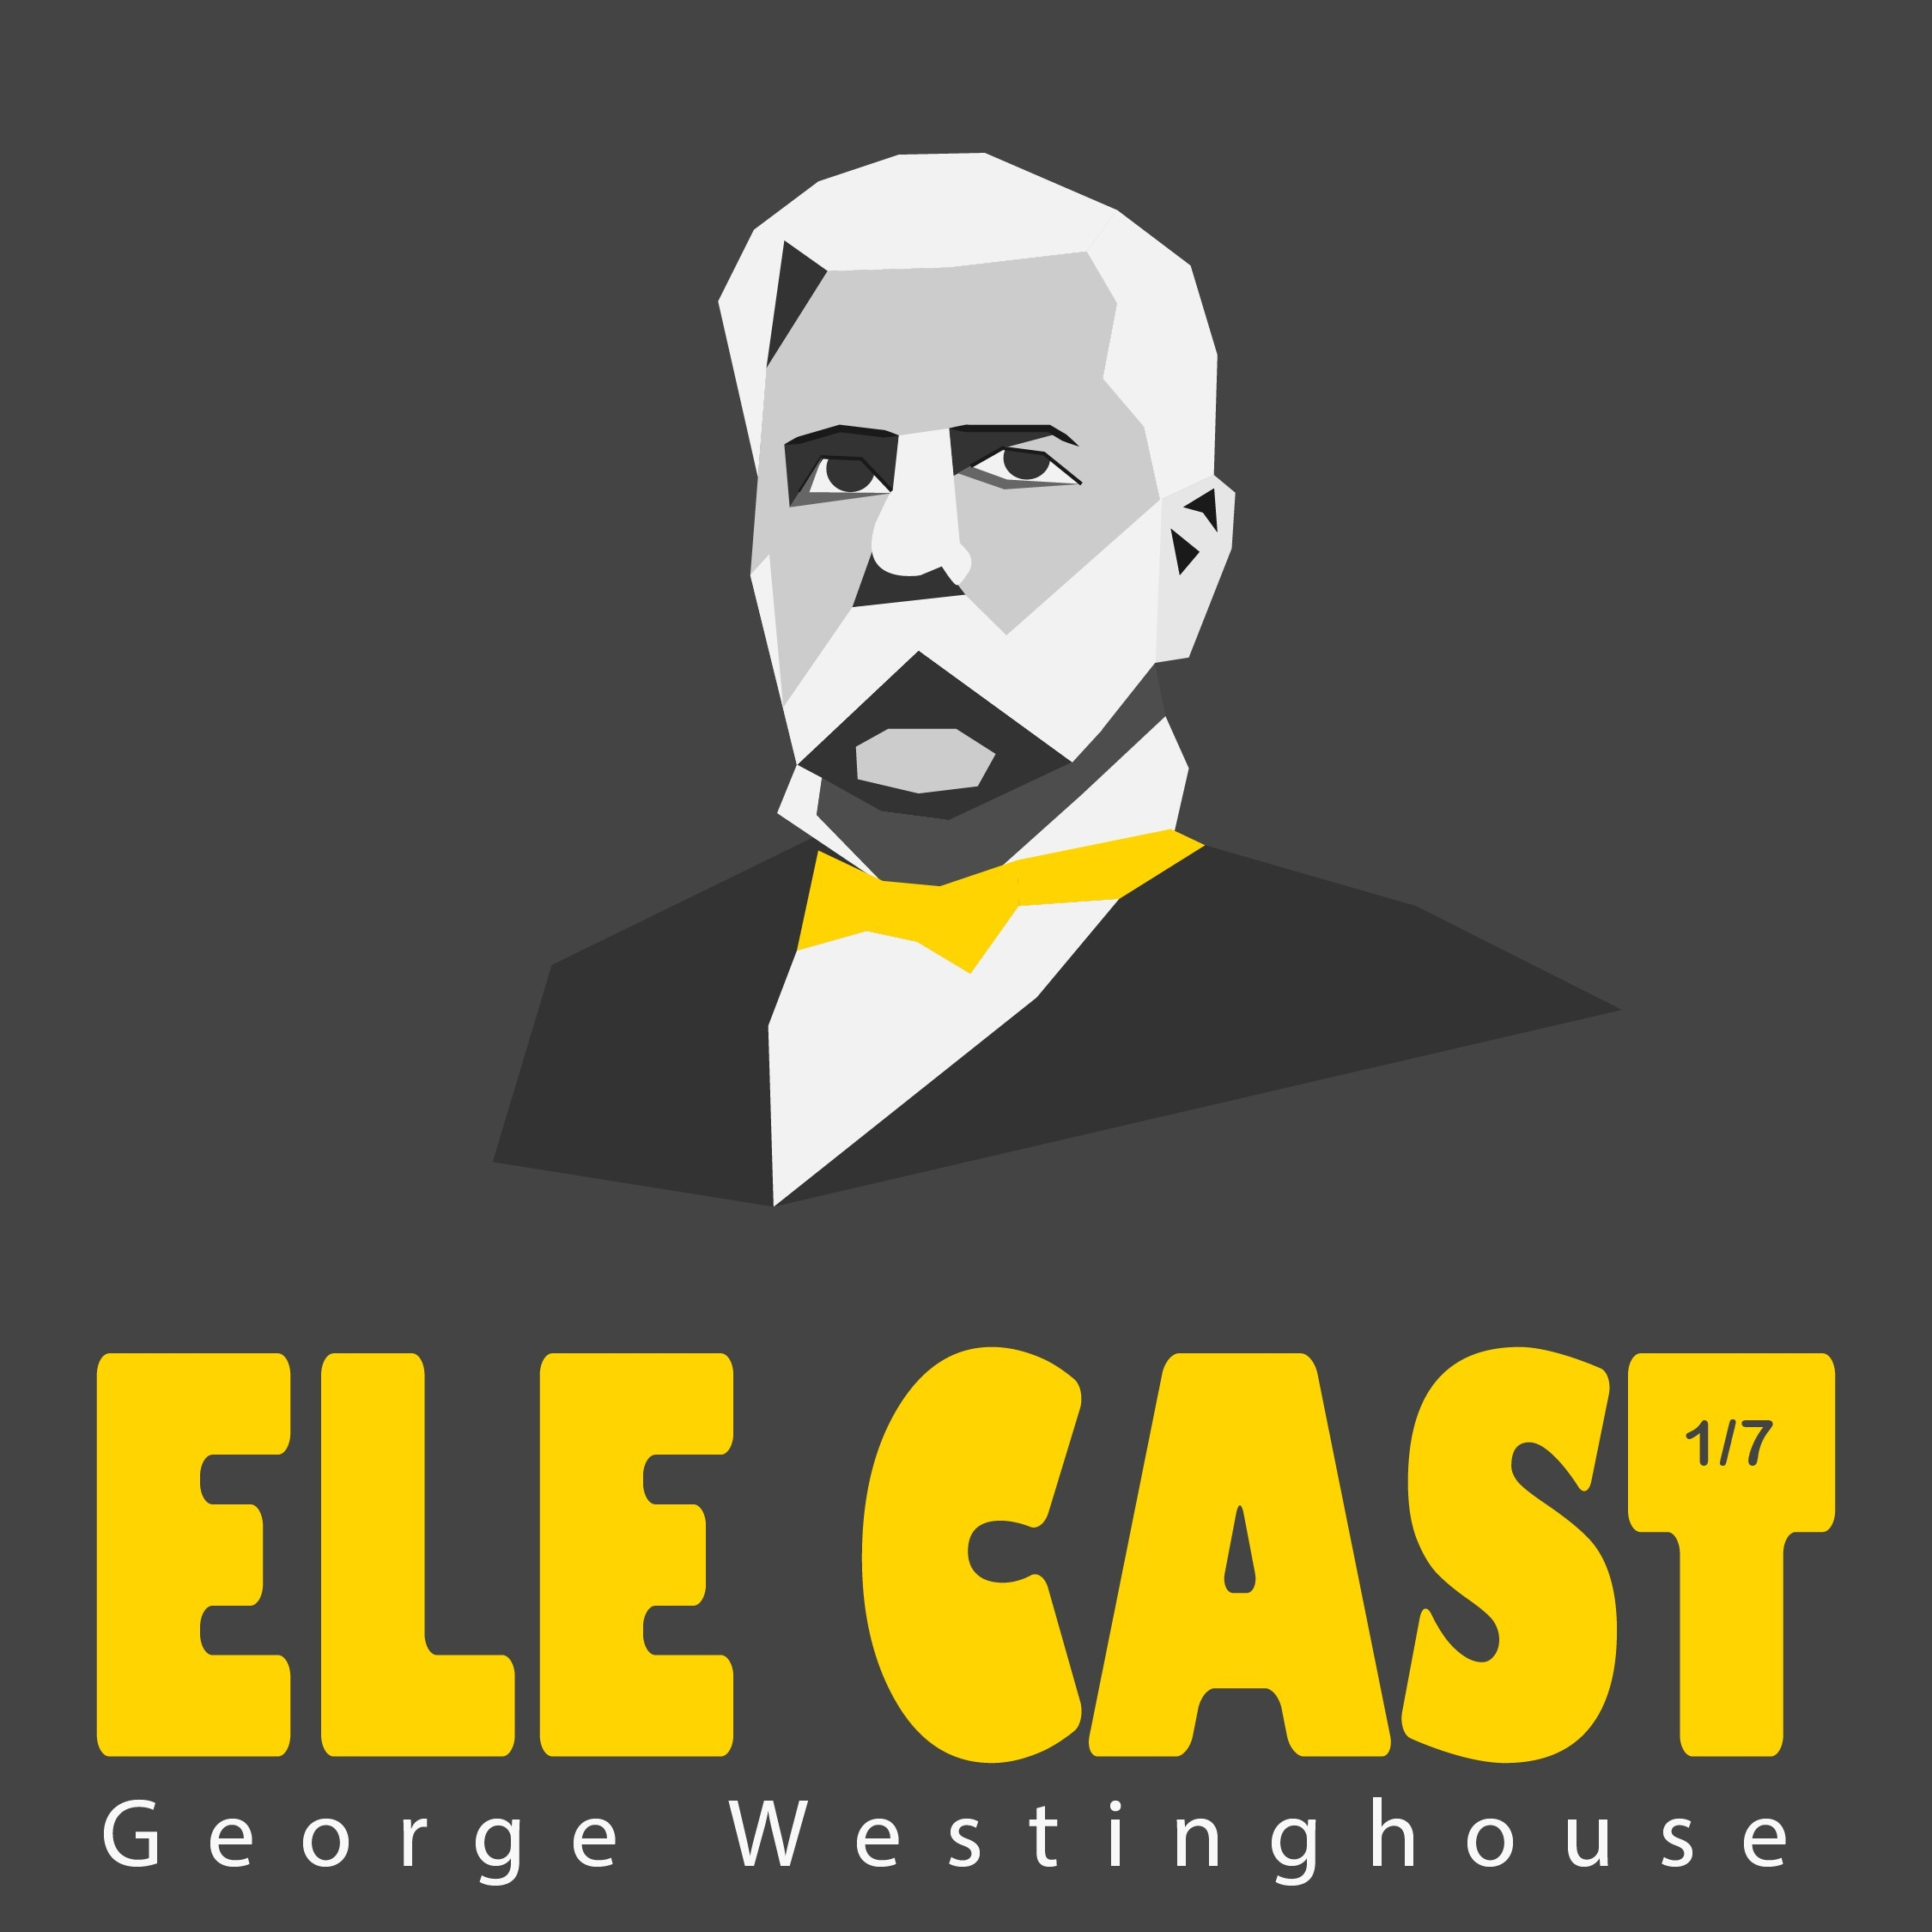 Great George Westinghouse - جرج وستینگهاوس بزرگ